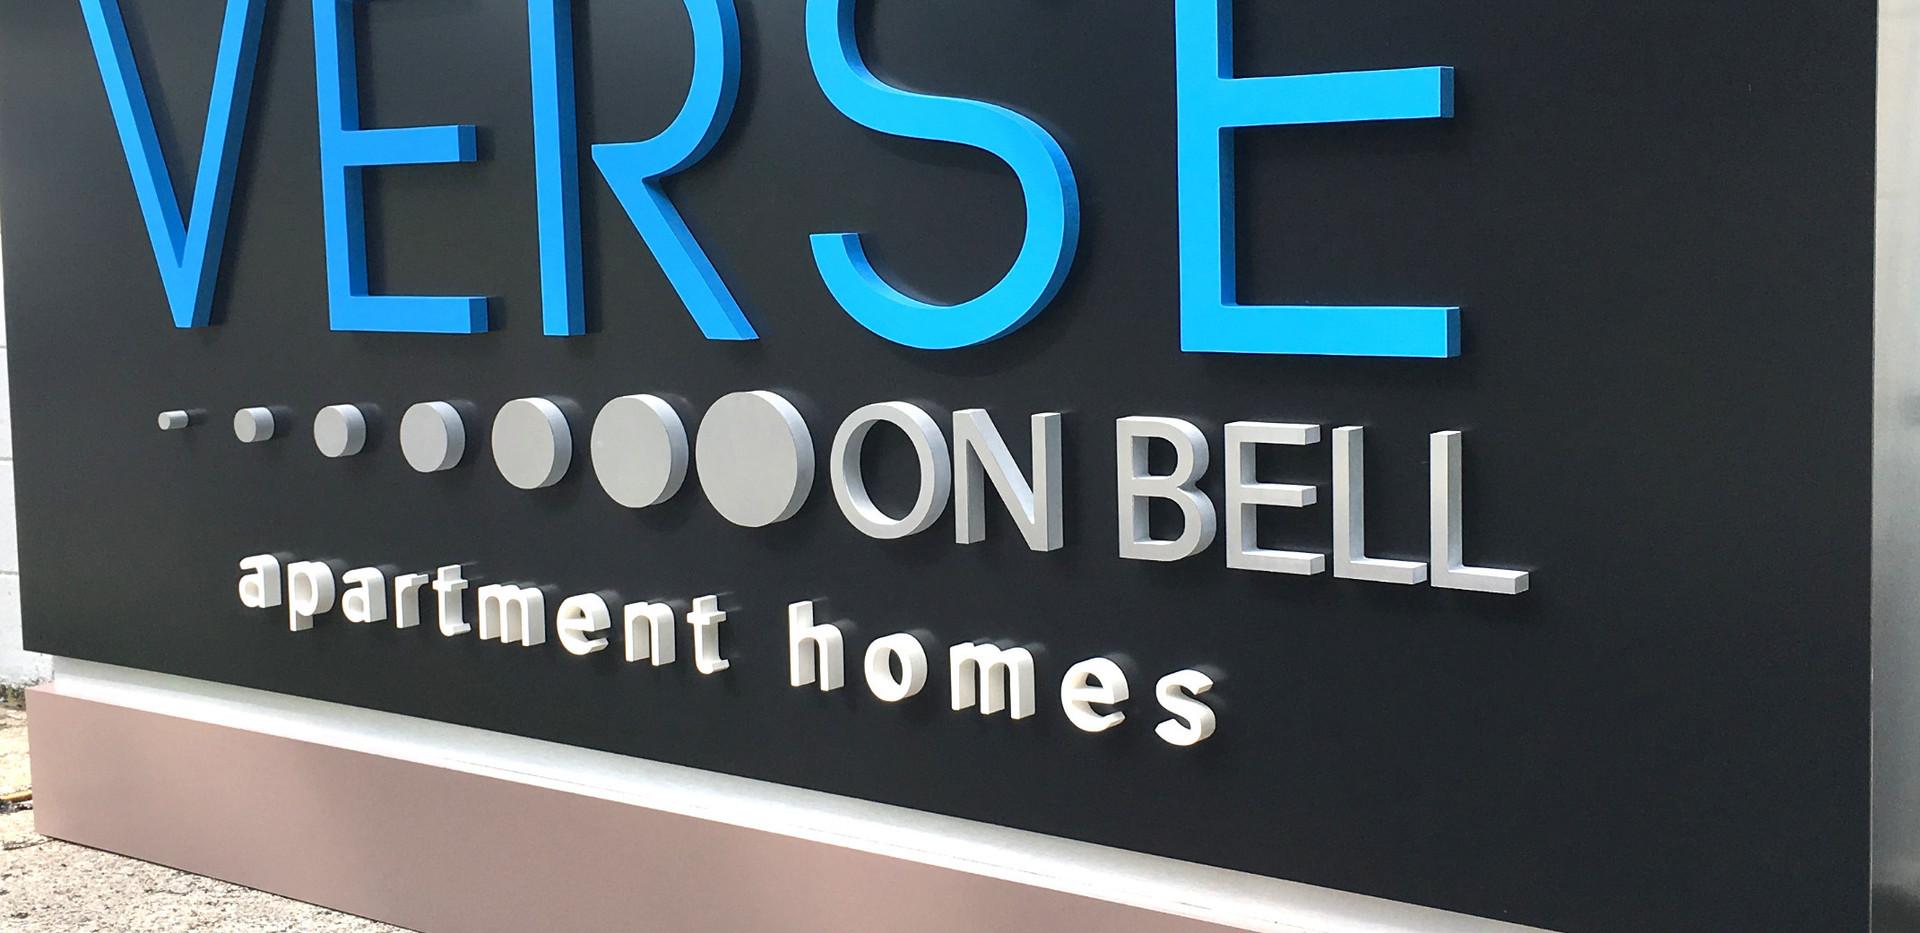 Verse - Apartment Homes, TN